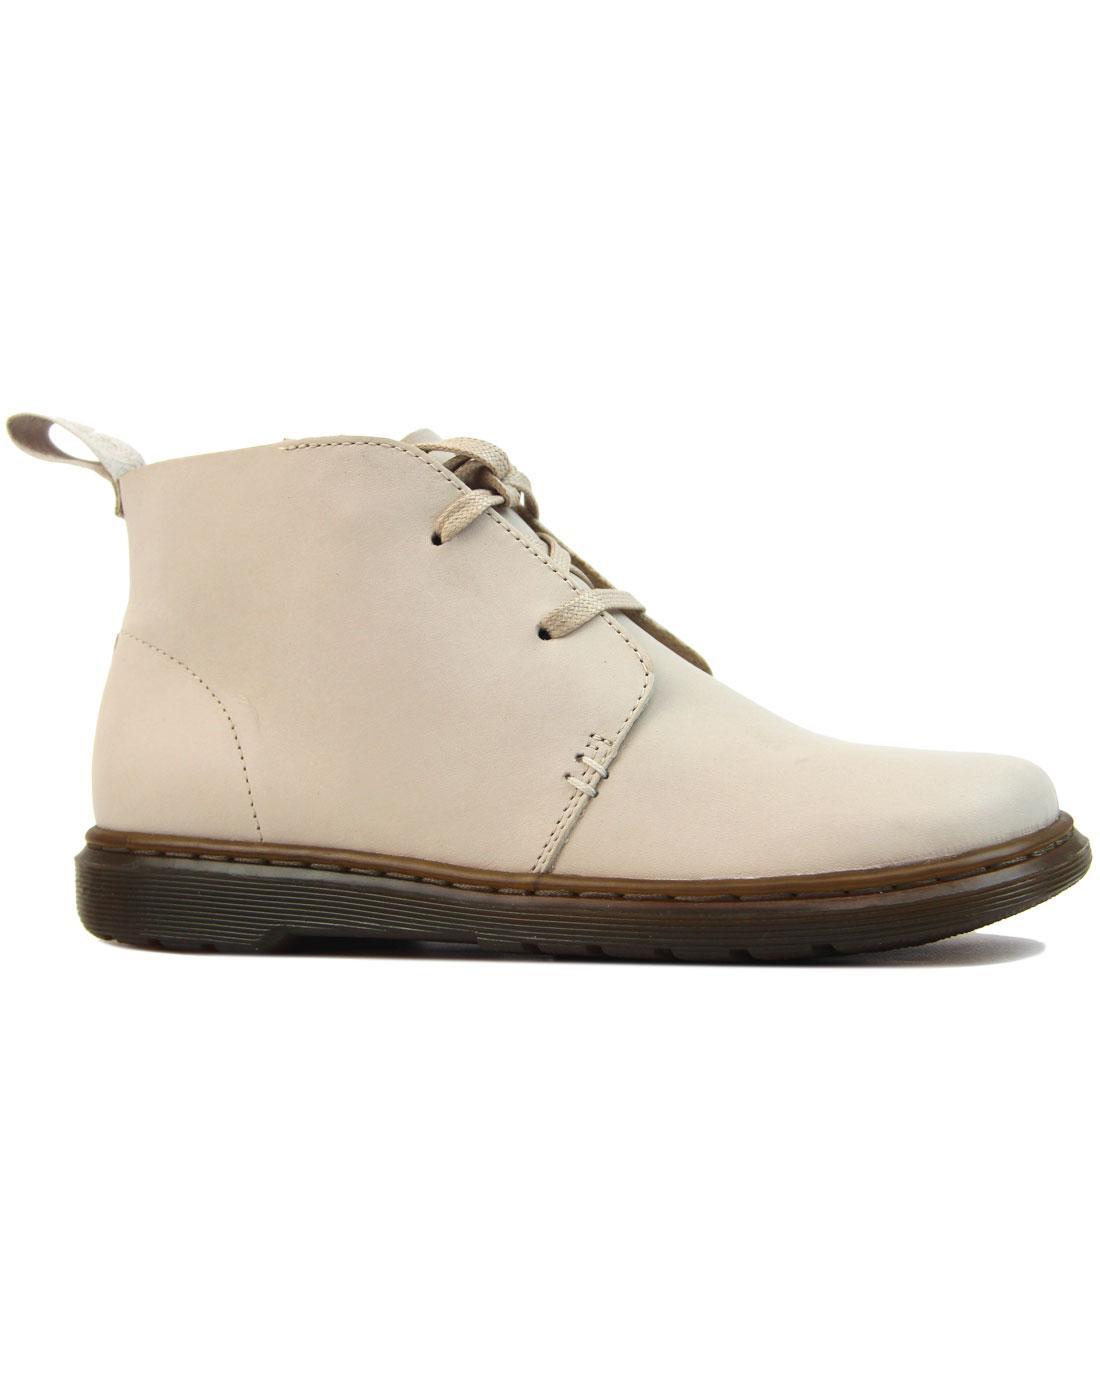 Cynthia DR MARTENS Mod Bone Temperley Chukka Boots